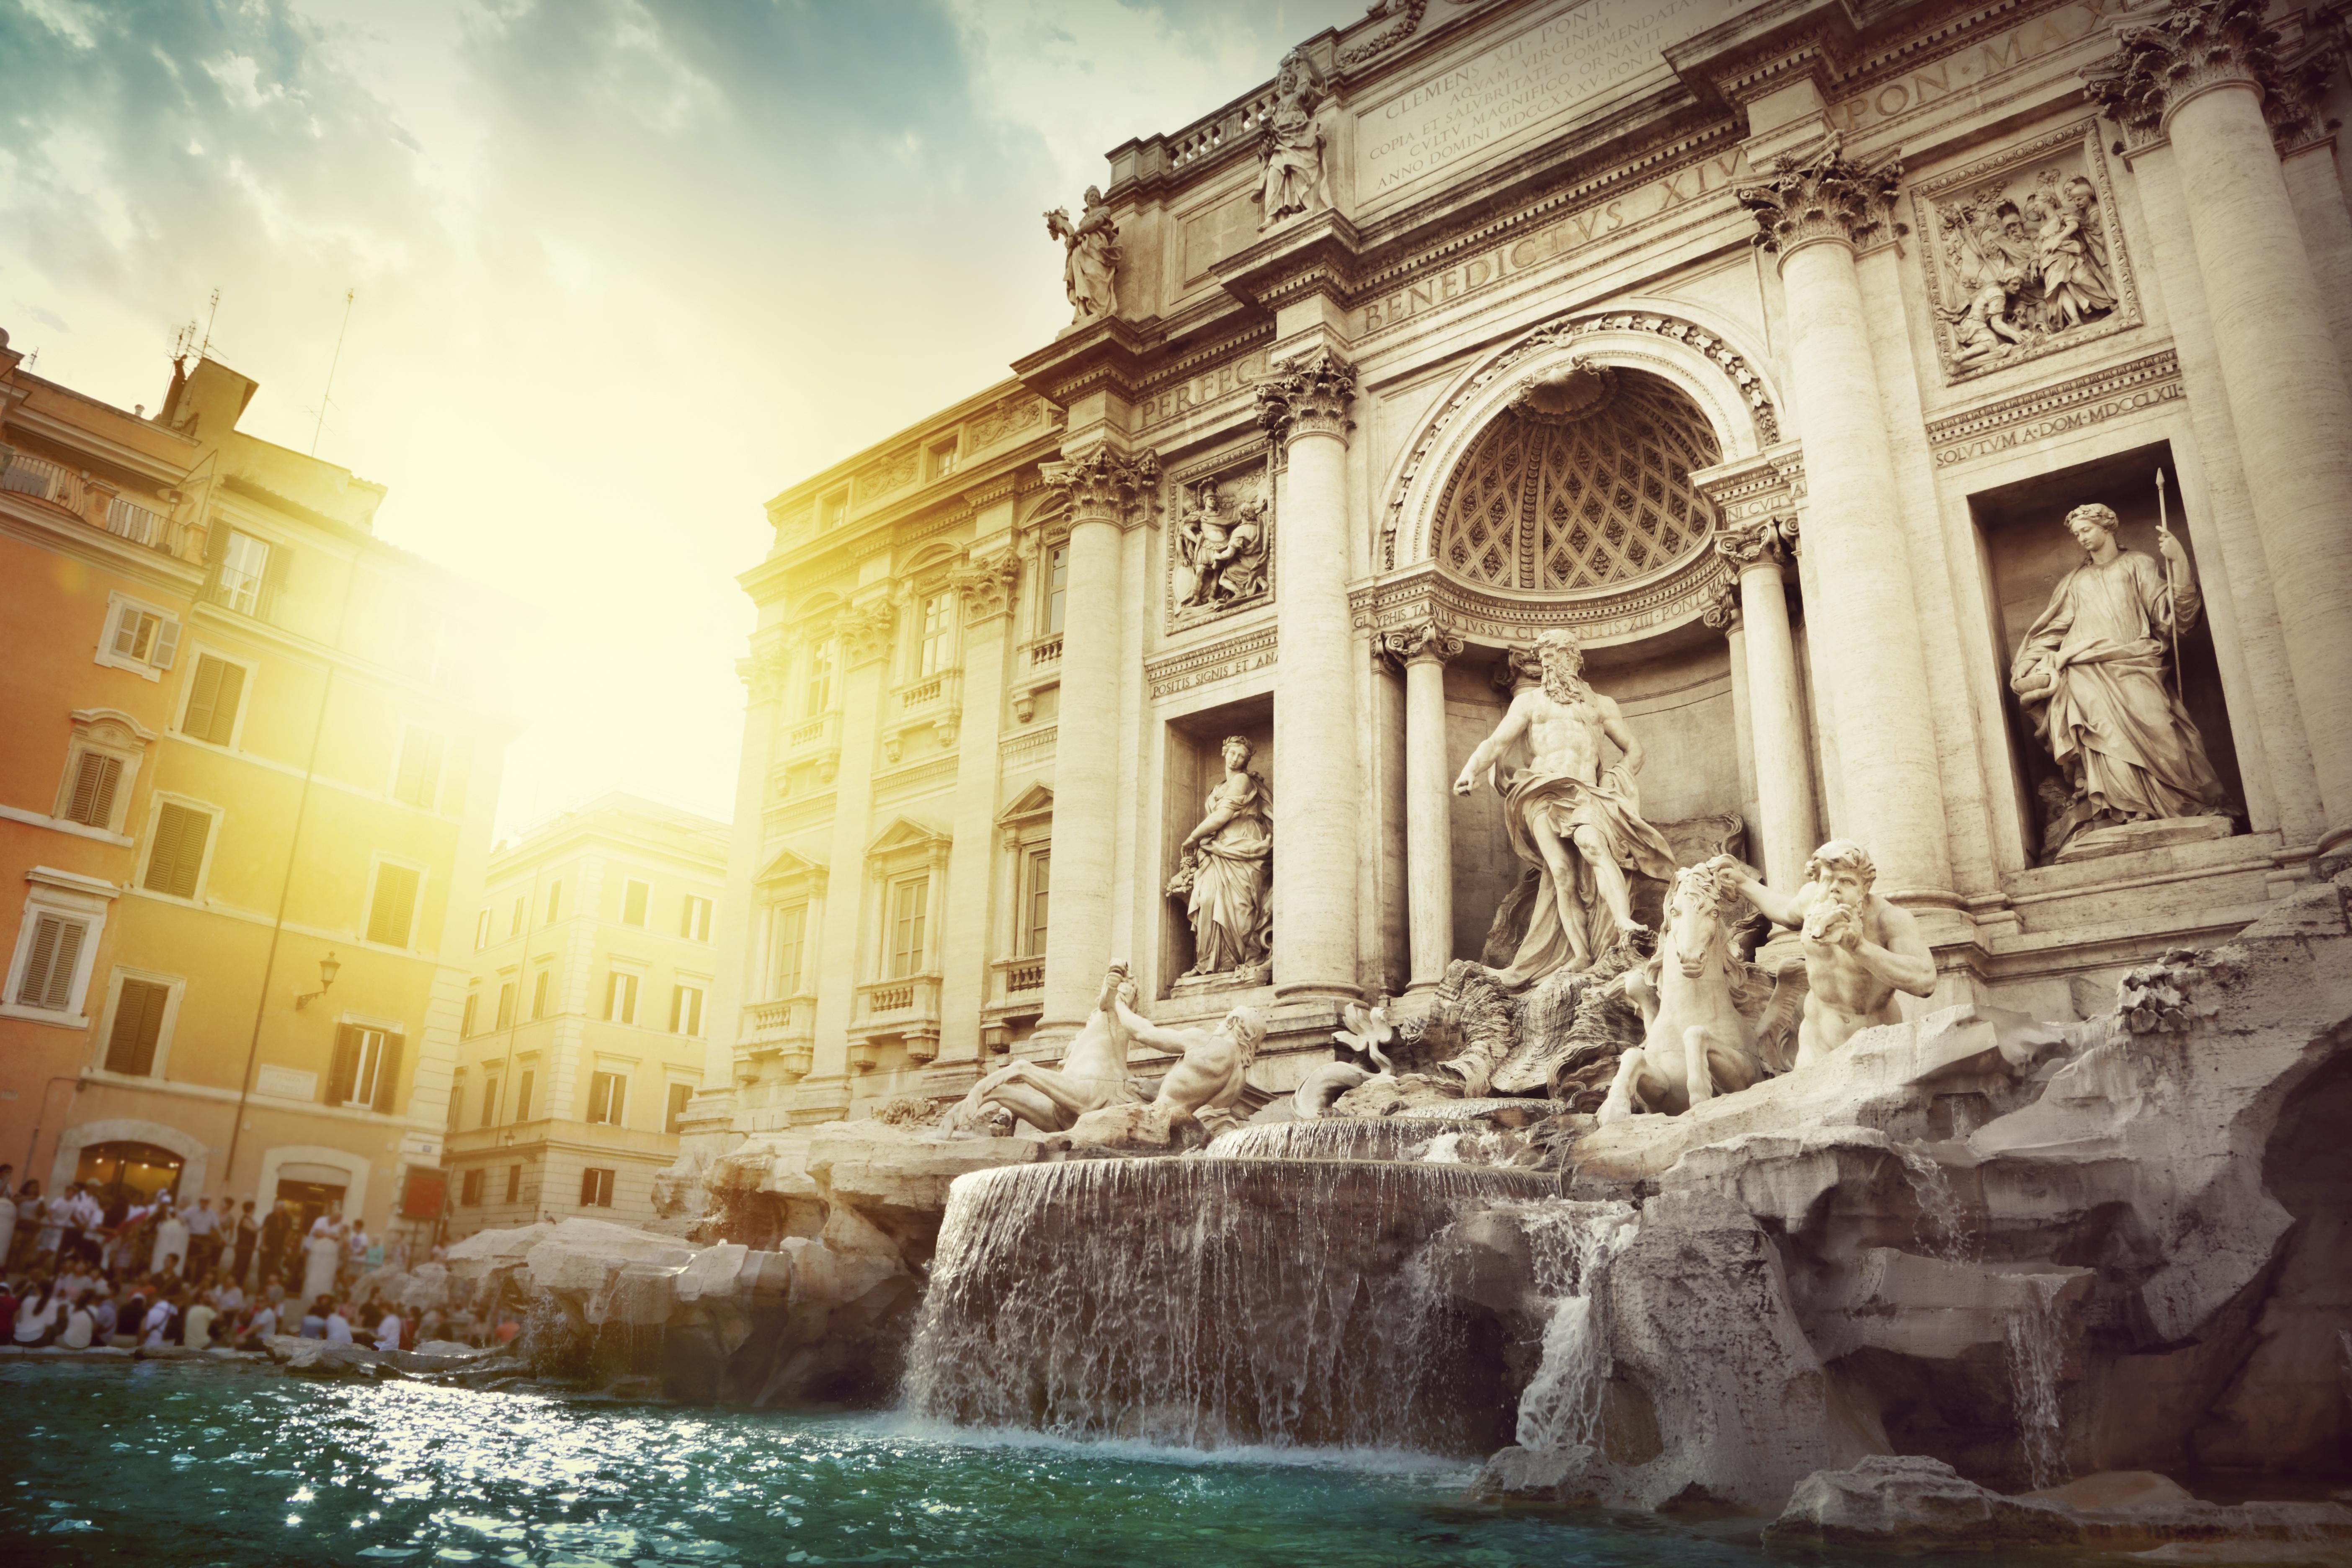 Summer Program - Art History | CIEE High School Summer Abroad: Exploring Rome Through the Arts